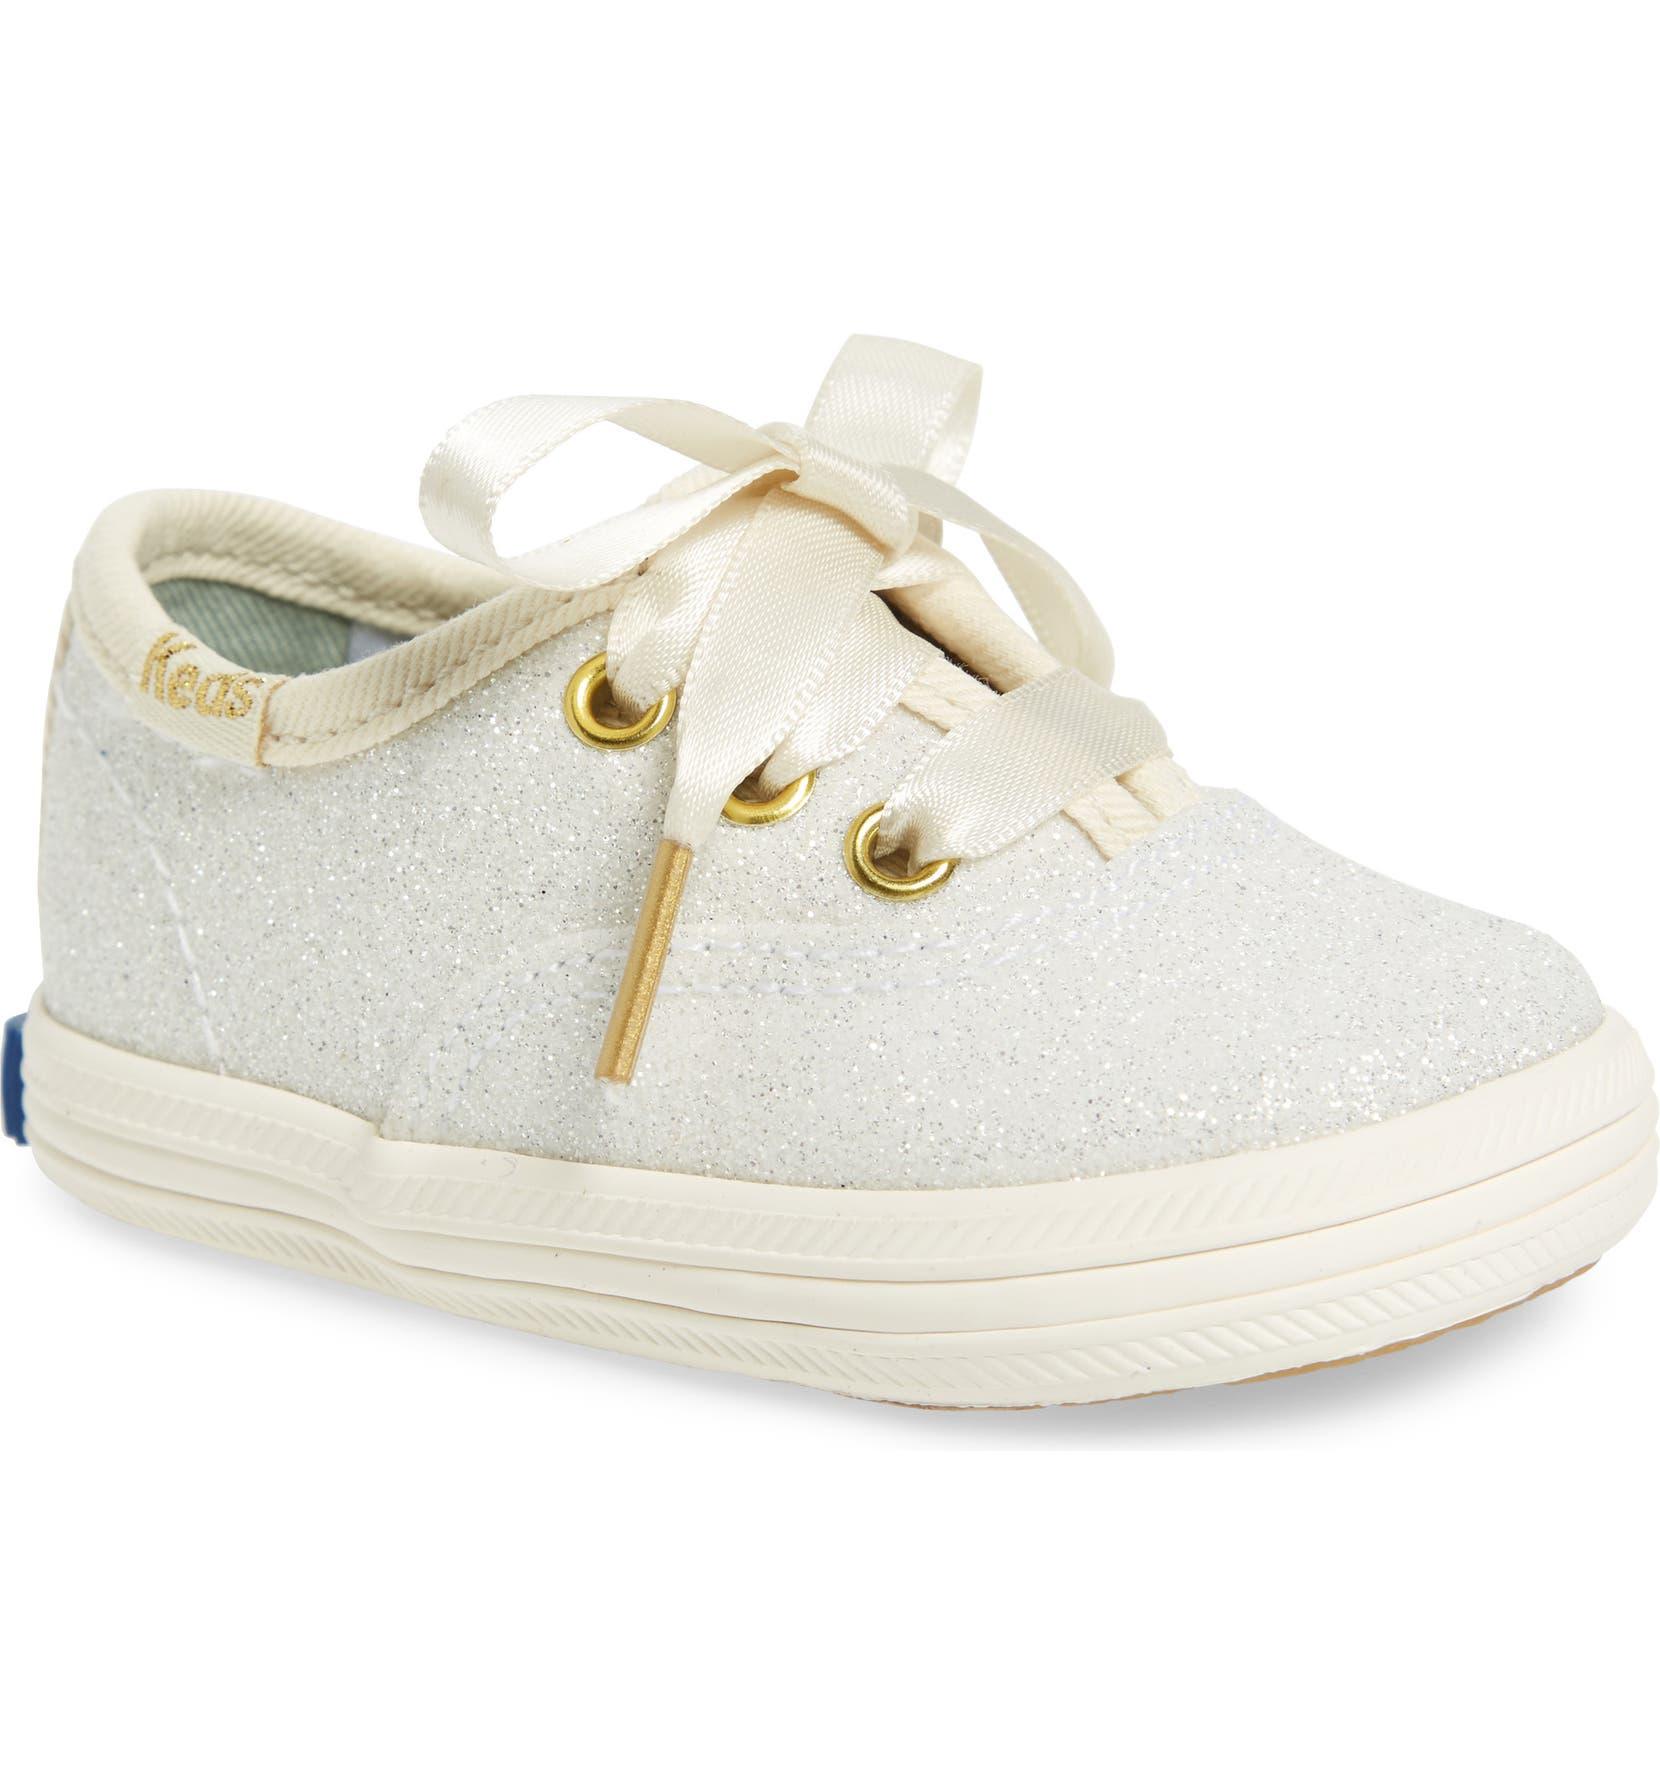 5b210e5abbf Keds® x kate spade new york Champion Glitter Crib Shoe (Baby ...